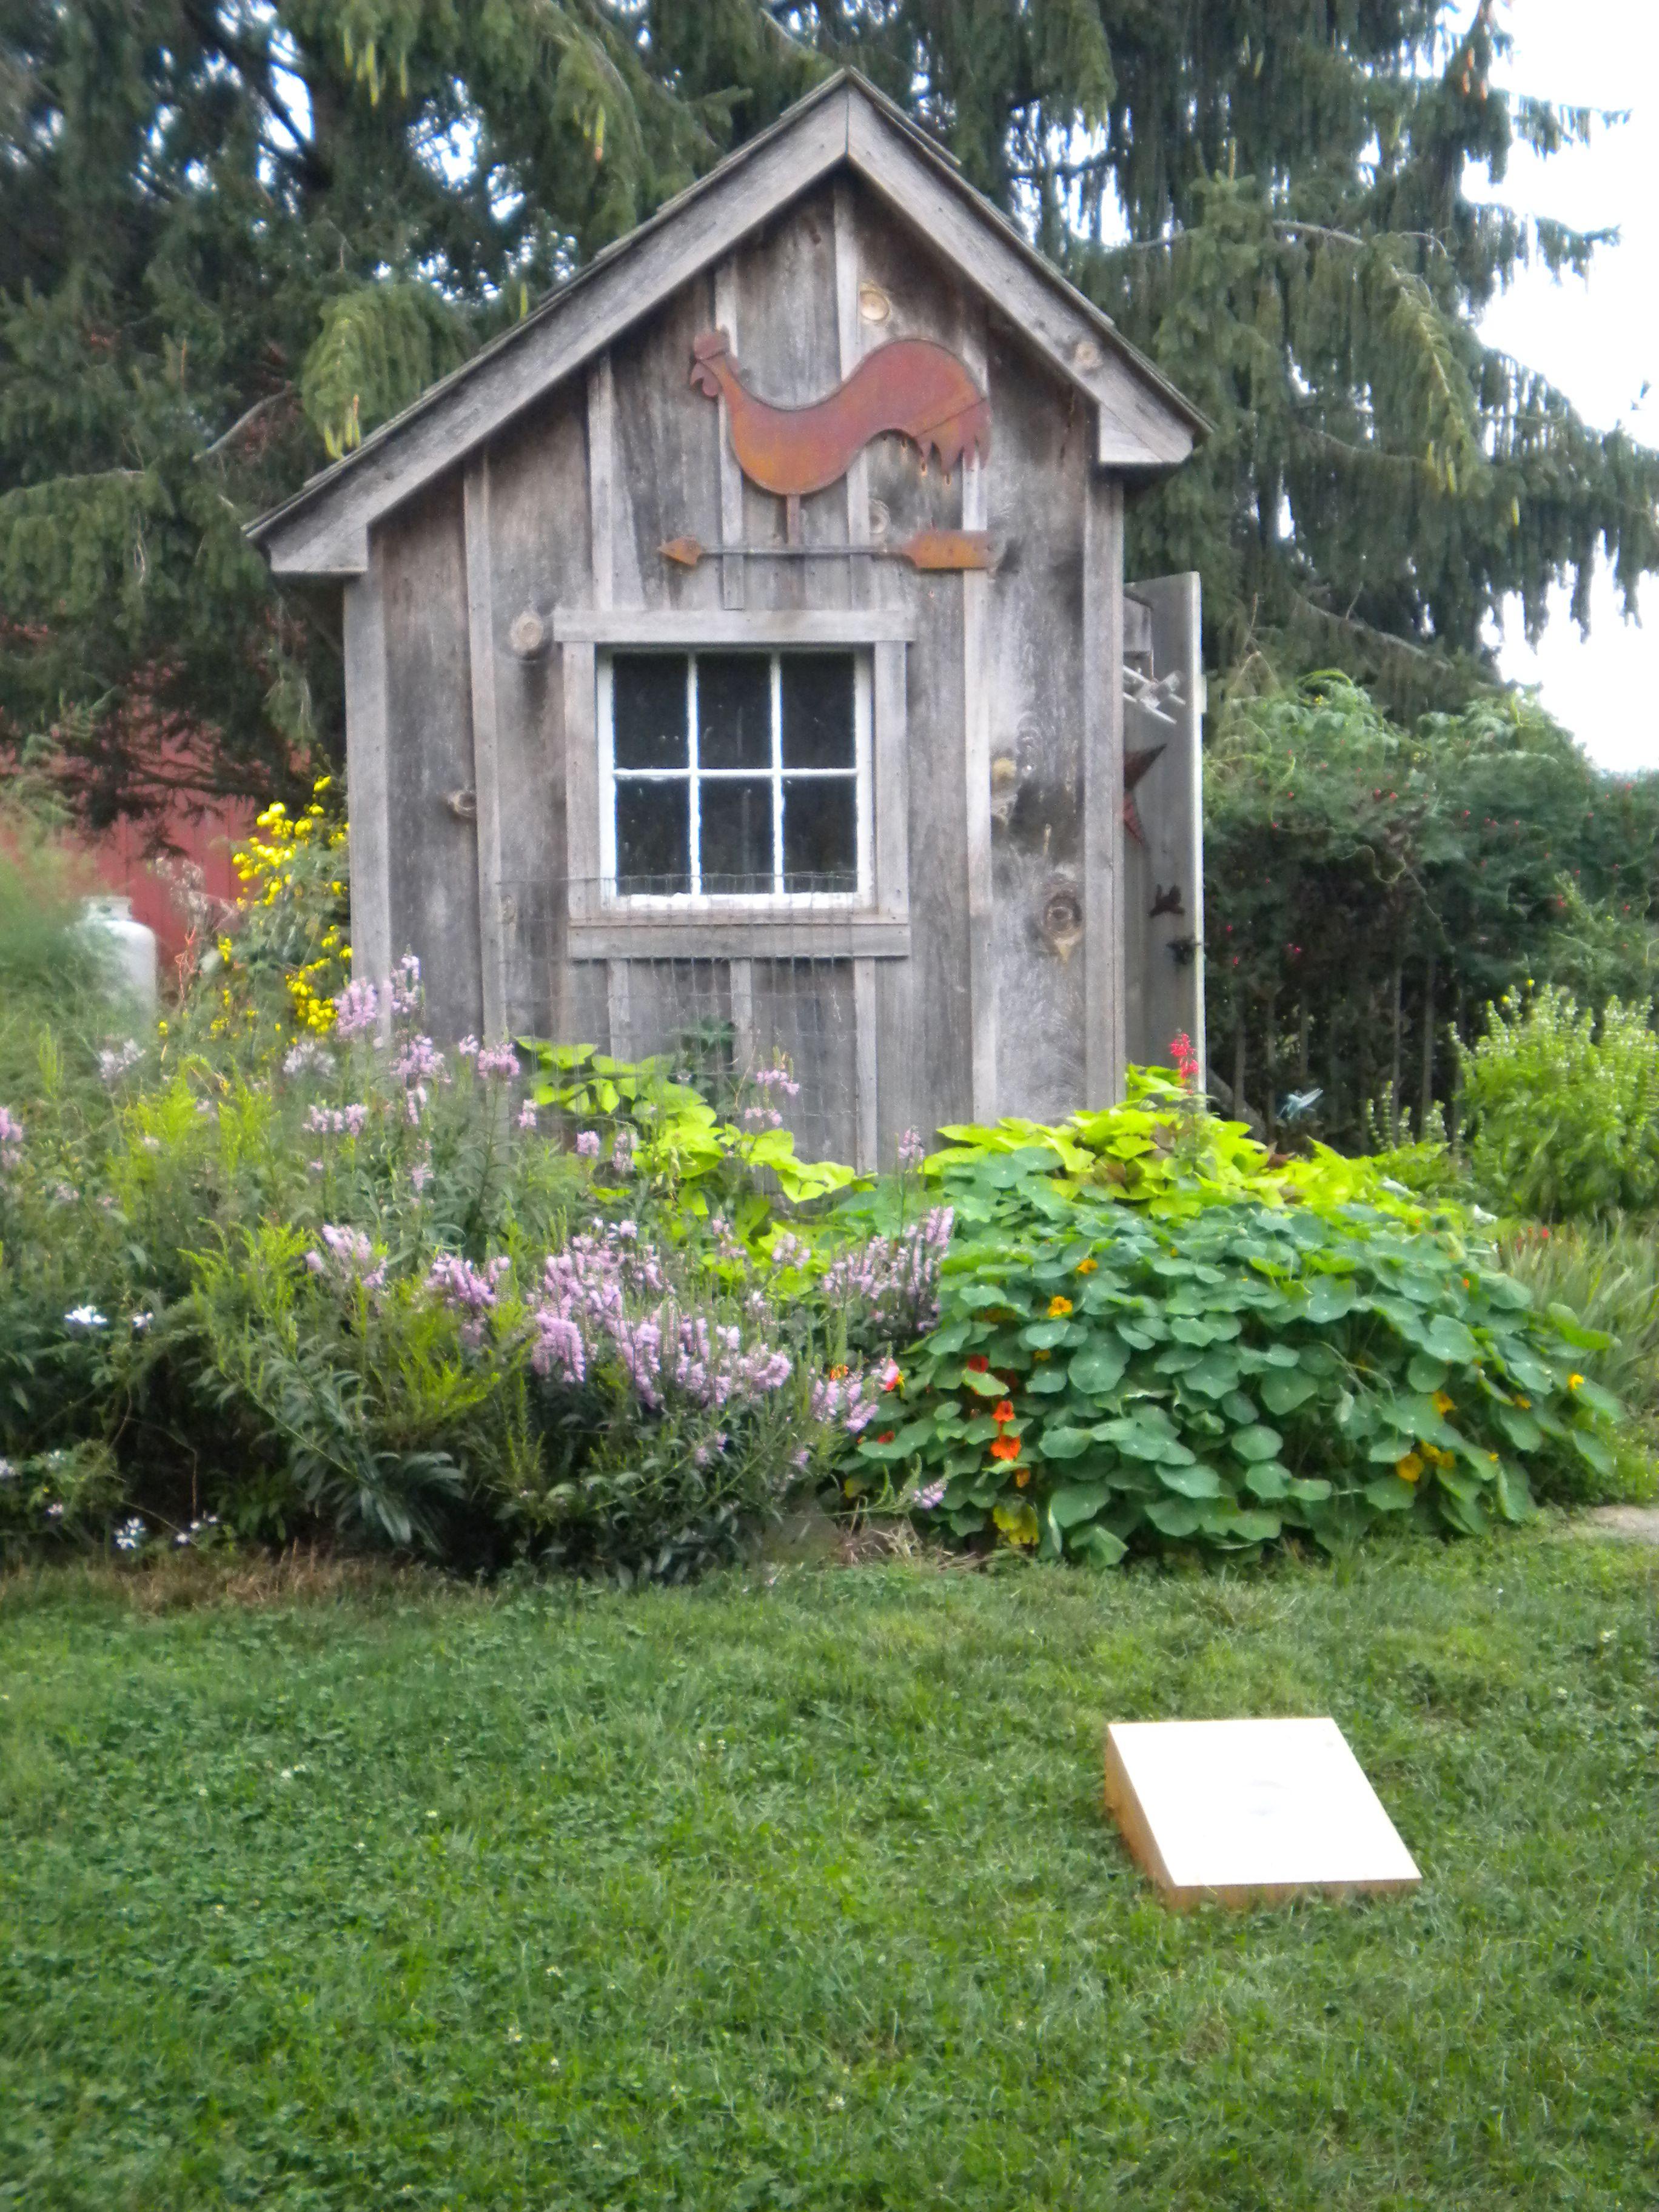 Backyard Chicken Coop Plans Backyard Chicken Coops: Homestead Chickens, Chickens Backyard, Chicken Coop Run